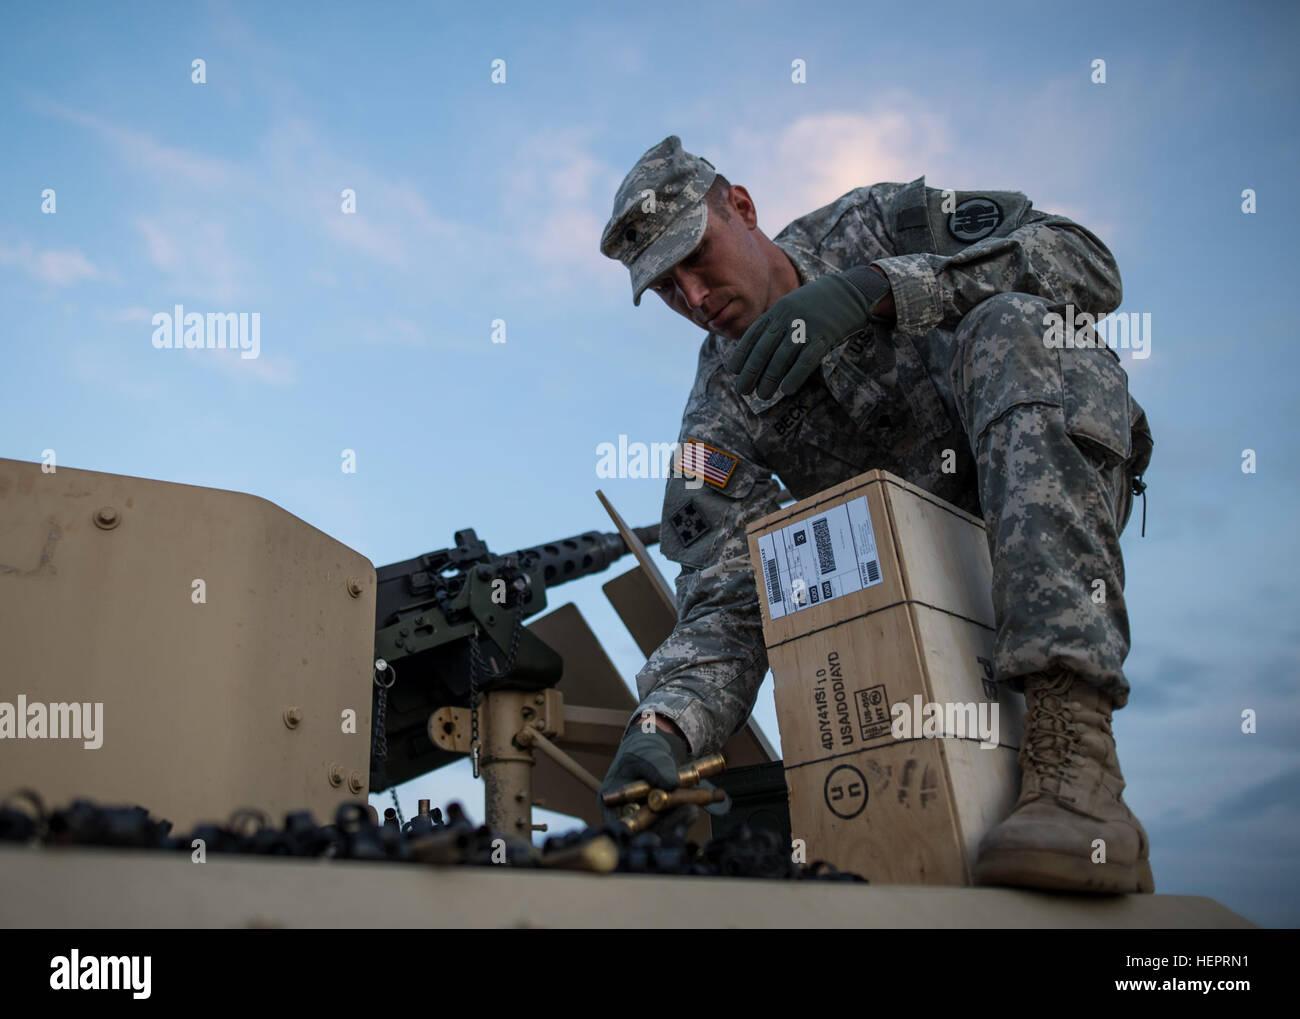 Spc Trenton Beck Of Marysville California A U S Army Reserve Stock Photo Alamy